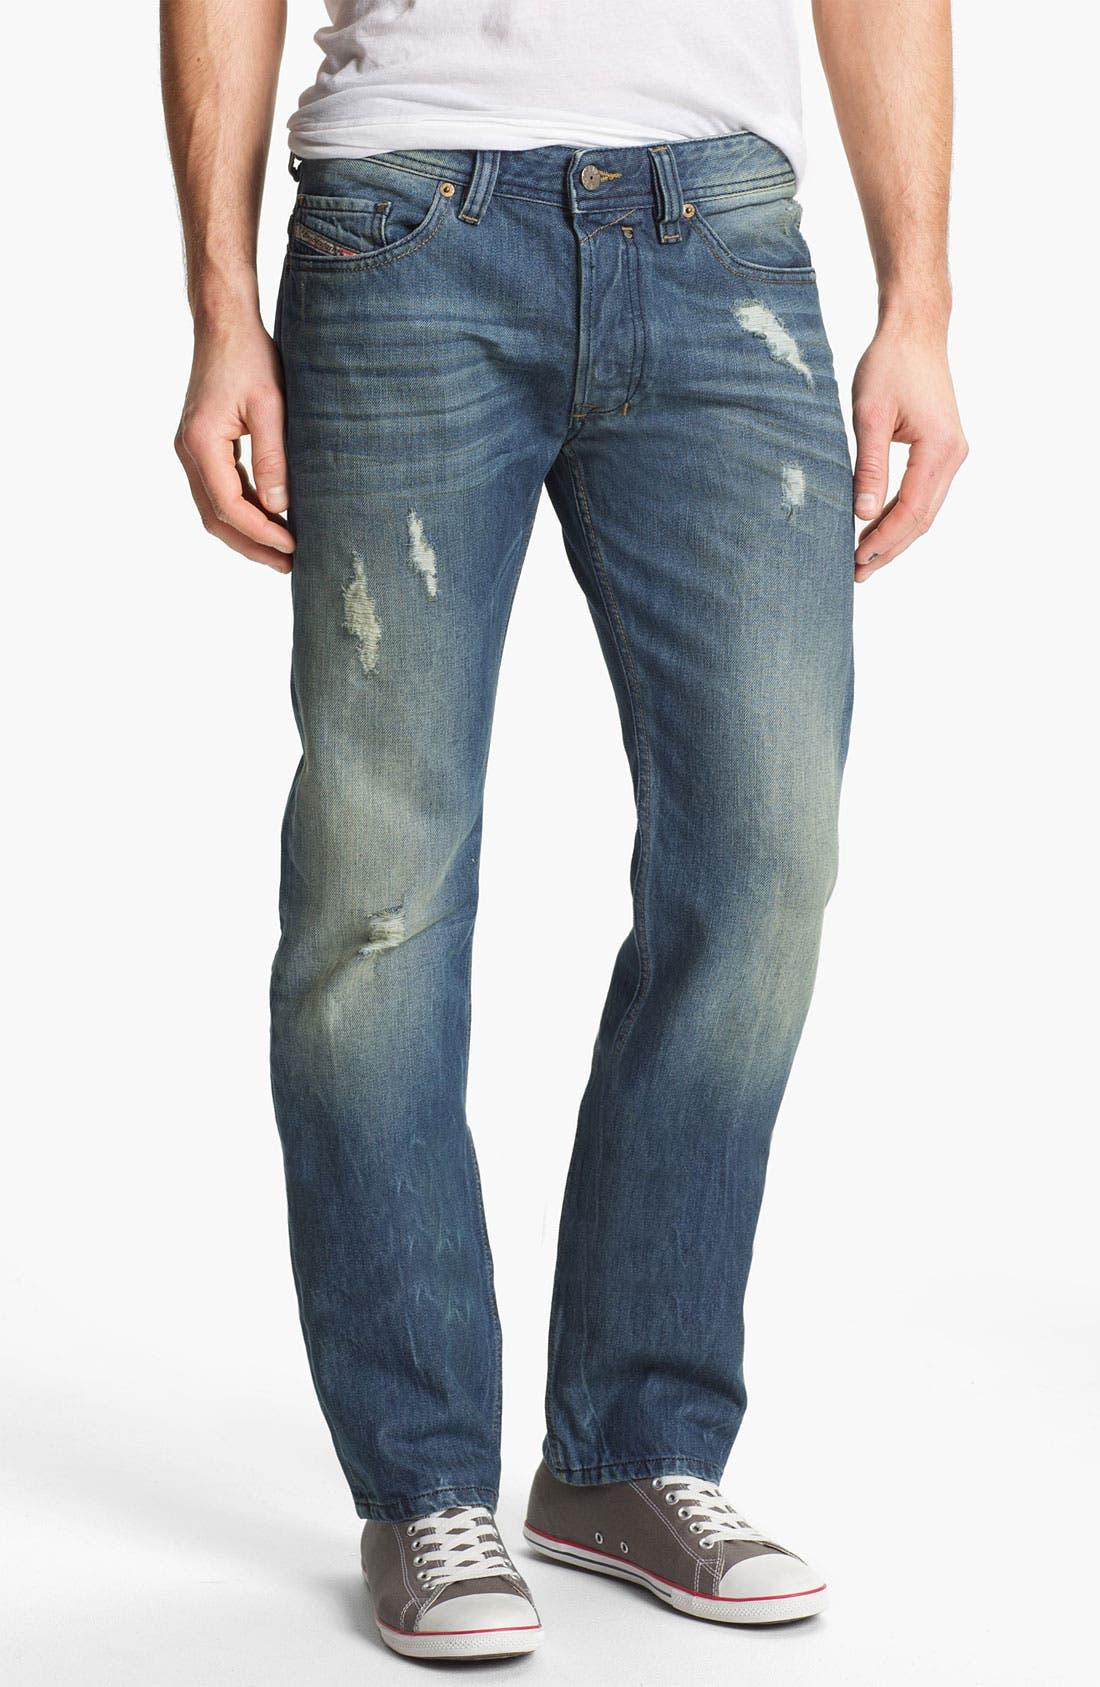 Alternate Image 1 Selected - DIESEL® 'Safado' Slim Straight Leg Jeans (0075I) (Online Only)